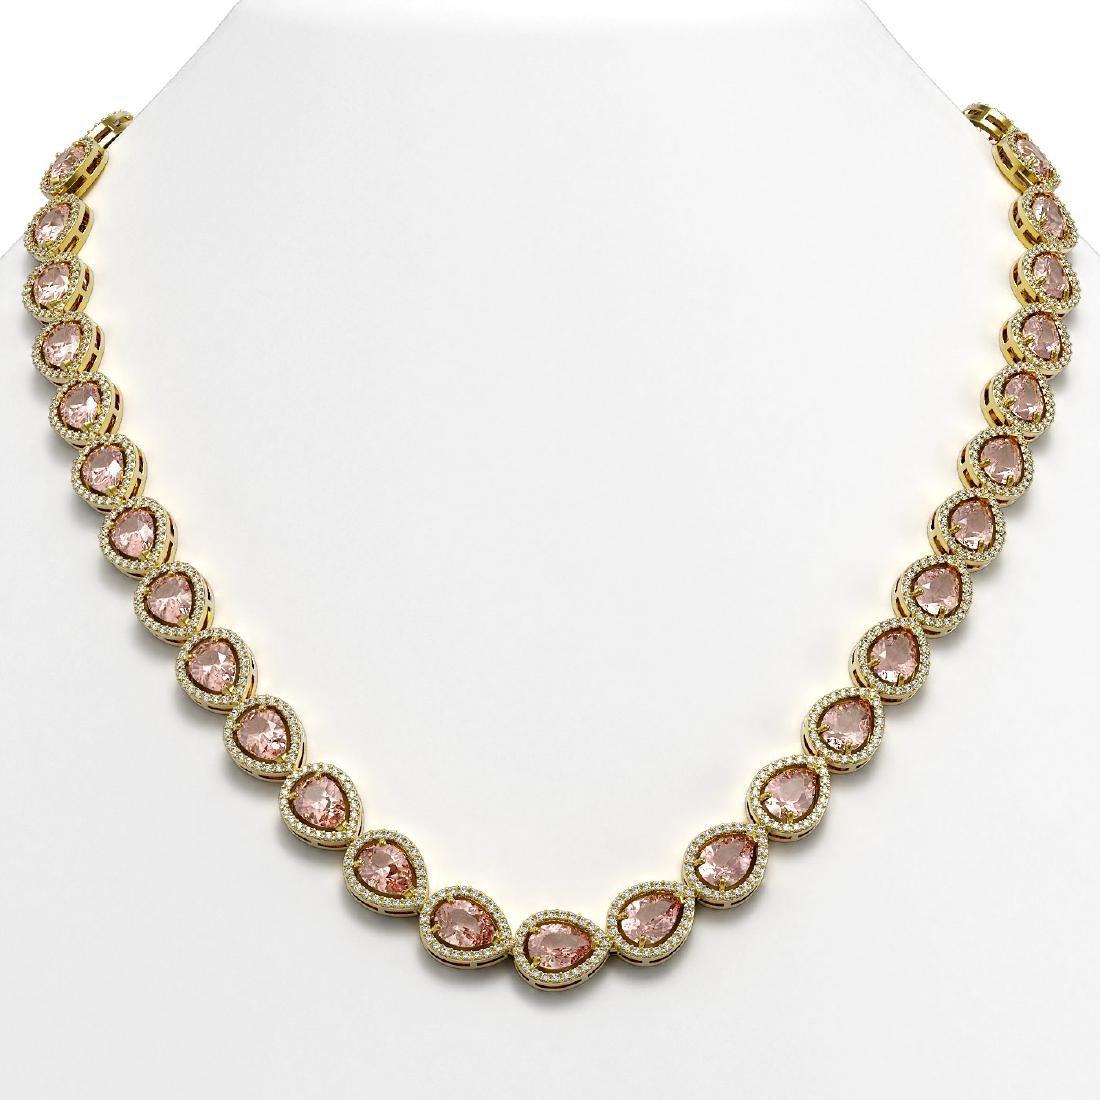 35.13 CTW Morganite & Diamond Halo Necklace 10K Yellow